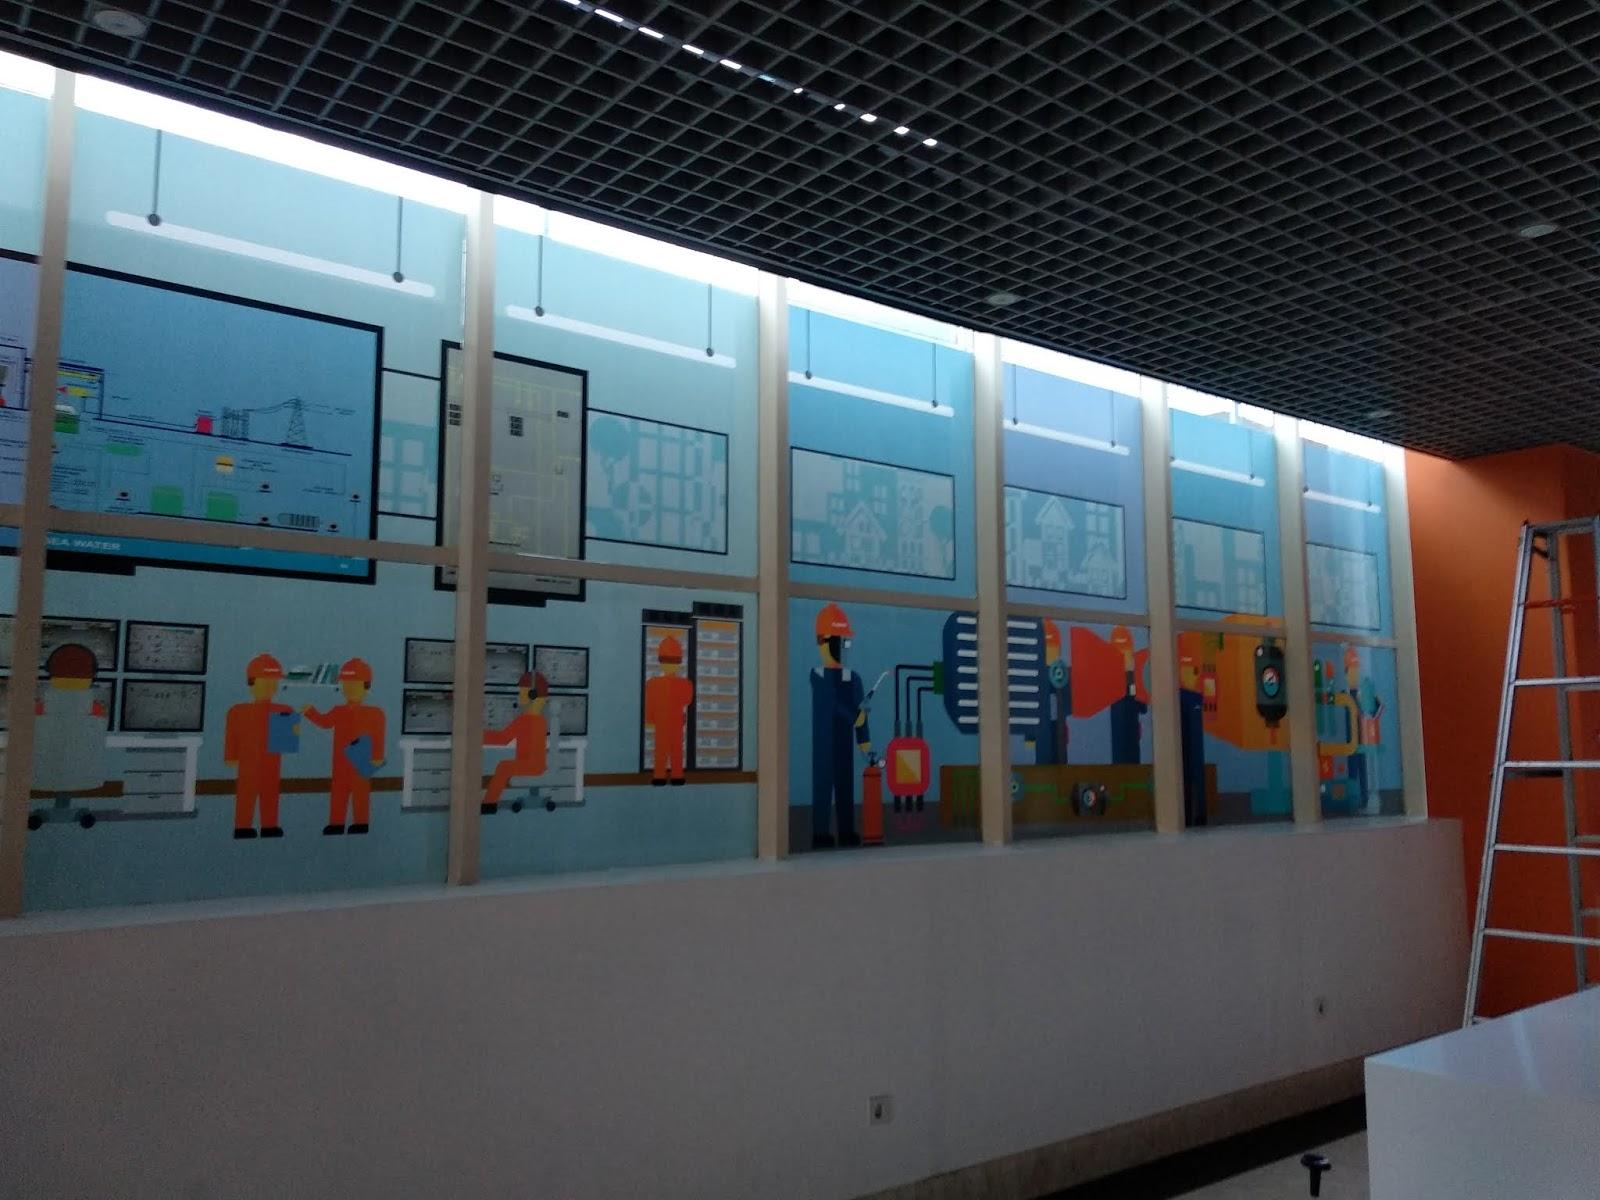 WALLPAPER KANTOR DEPOK Wallpaper Dinding Kantor